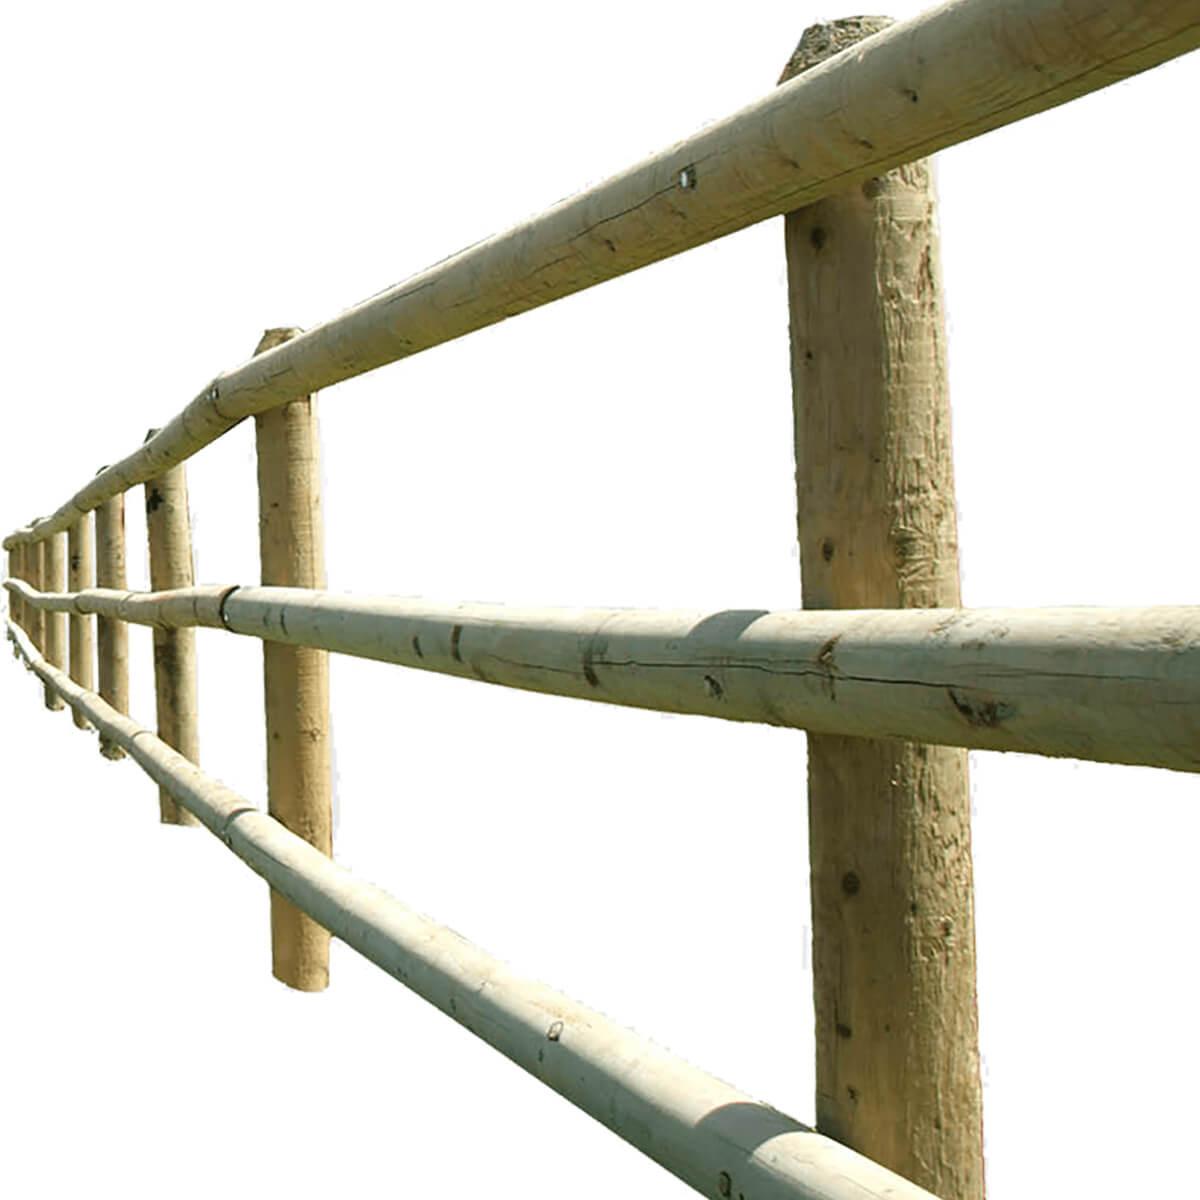 Dowelled Rail - Blunt - 3.25-in x 12-ft